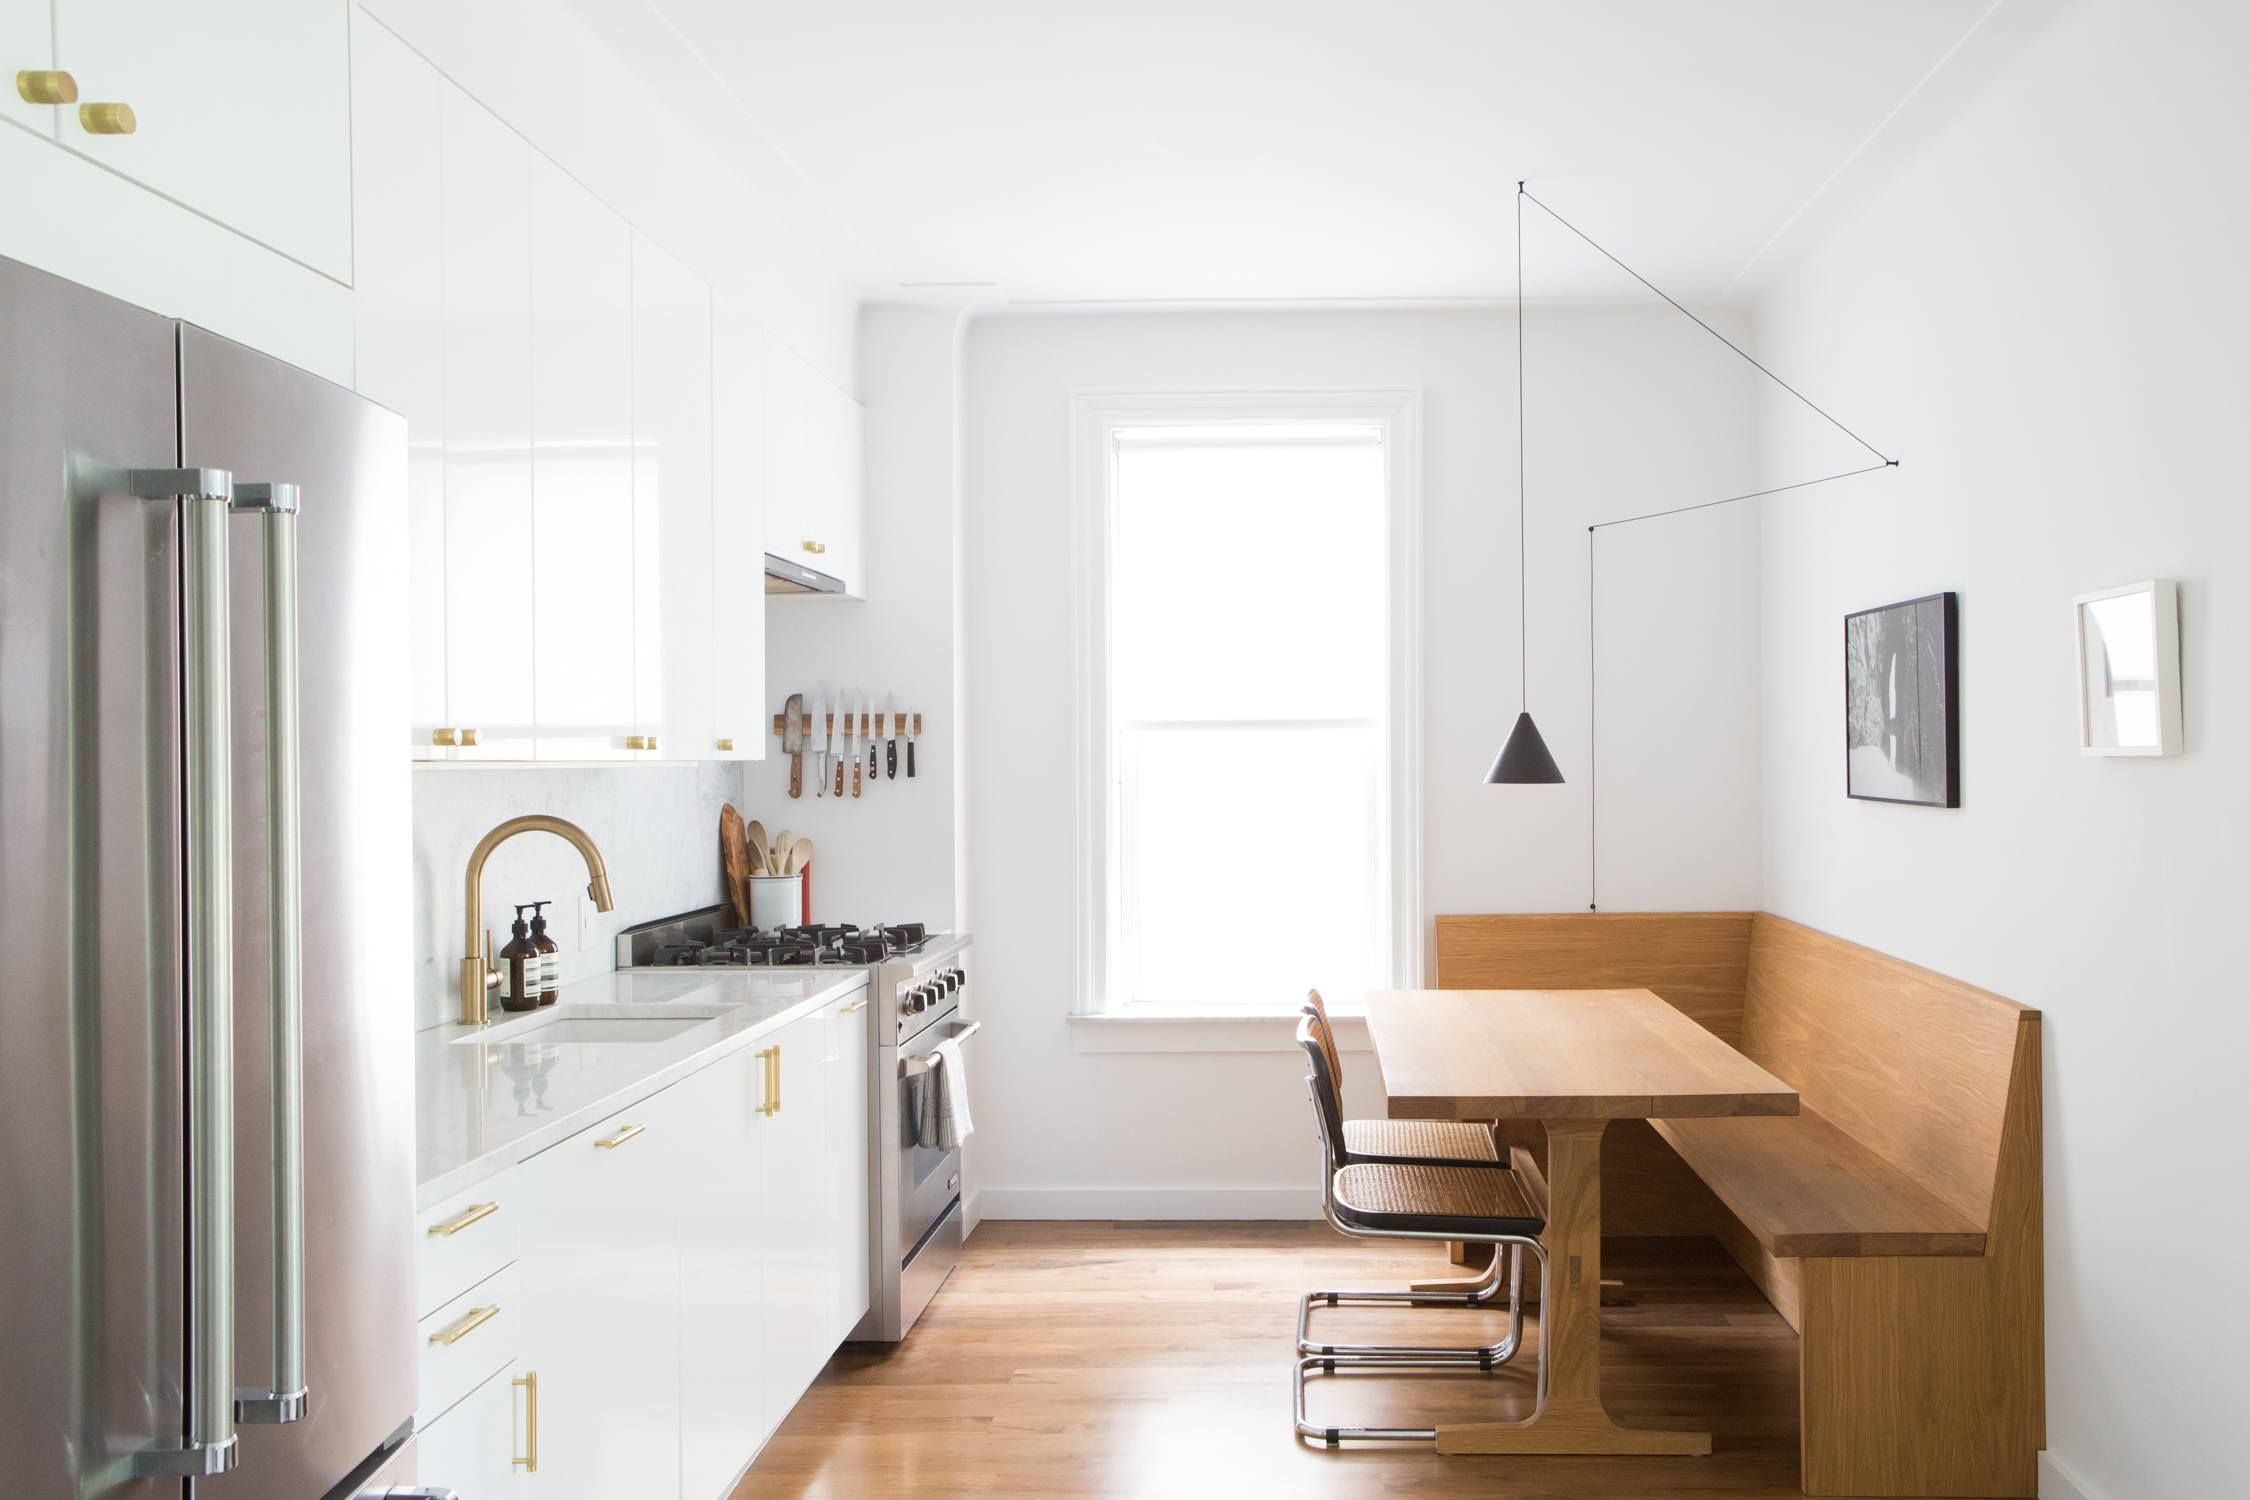 Kitchen Of The Week An Ikea Kitchen With An Elegant Upper Cabinet Impressive Brooklyn Kitchen Design Decorating Design